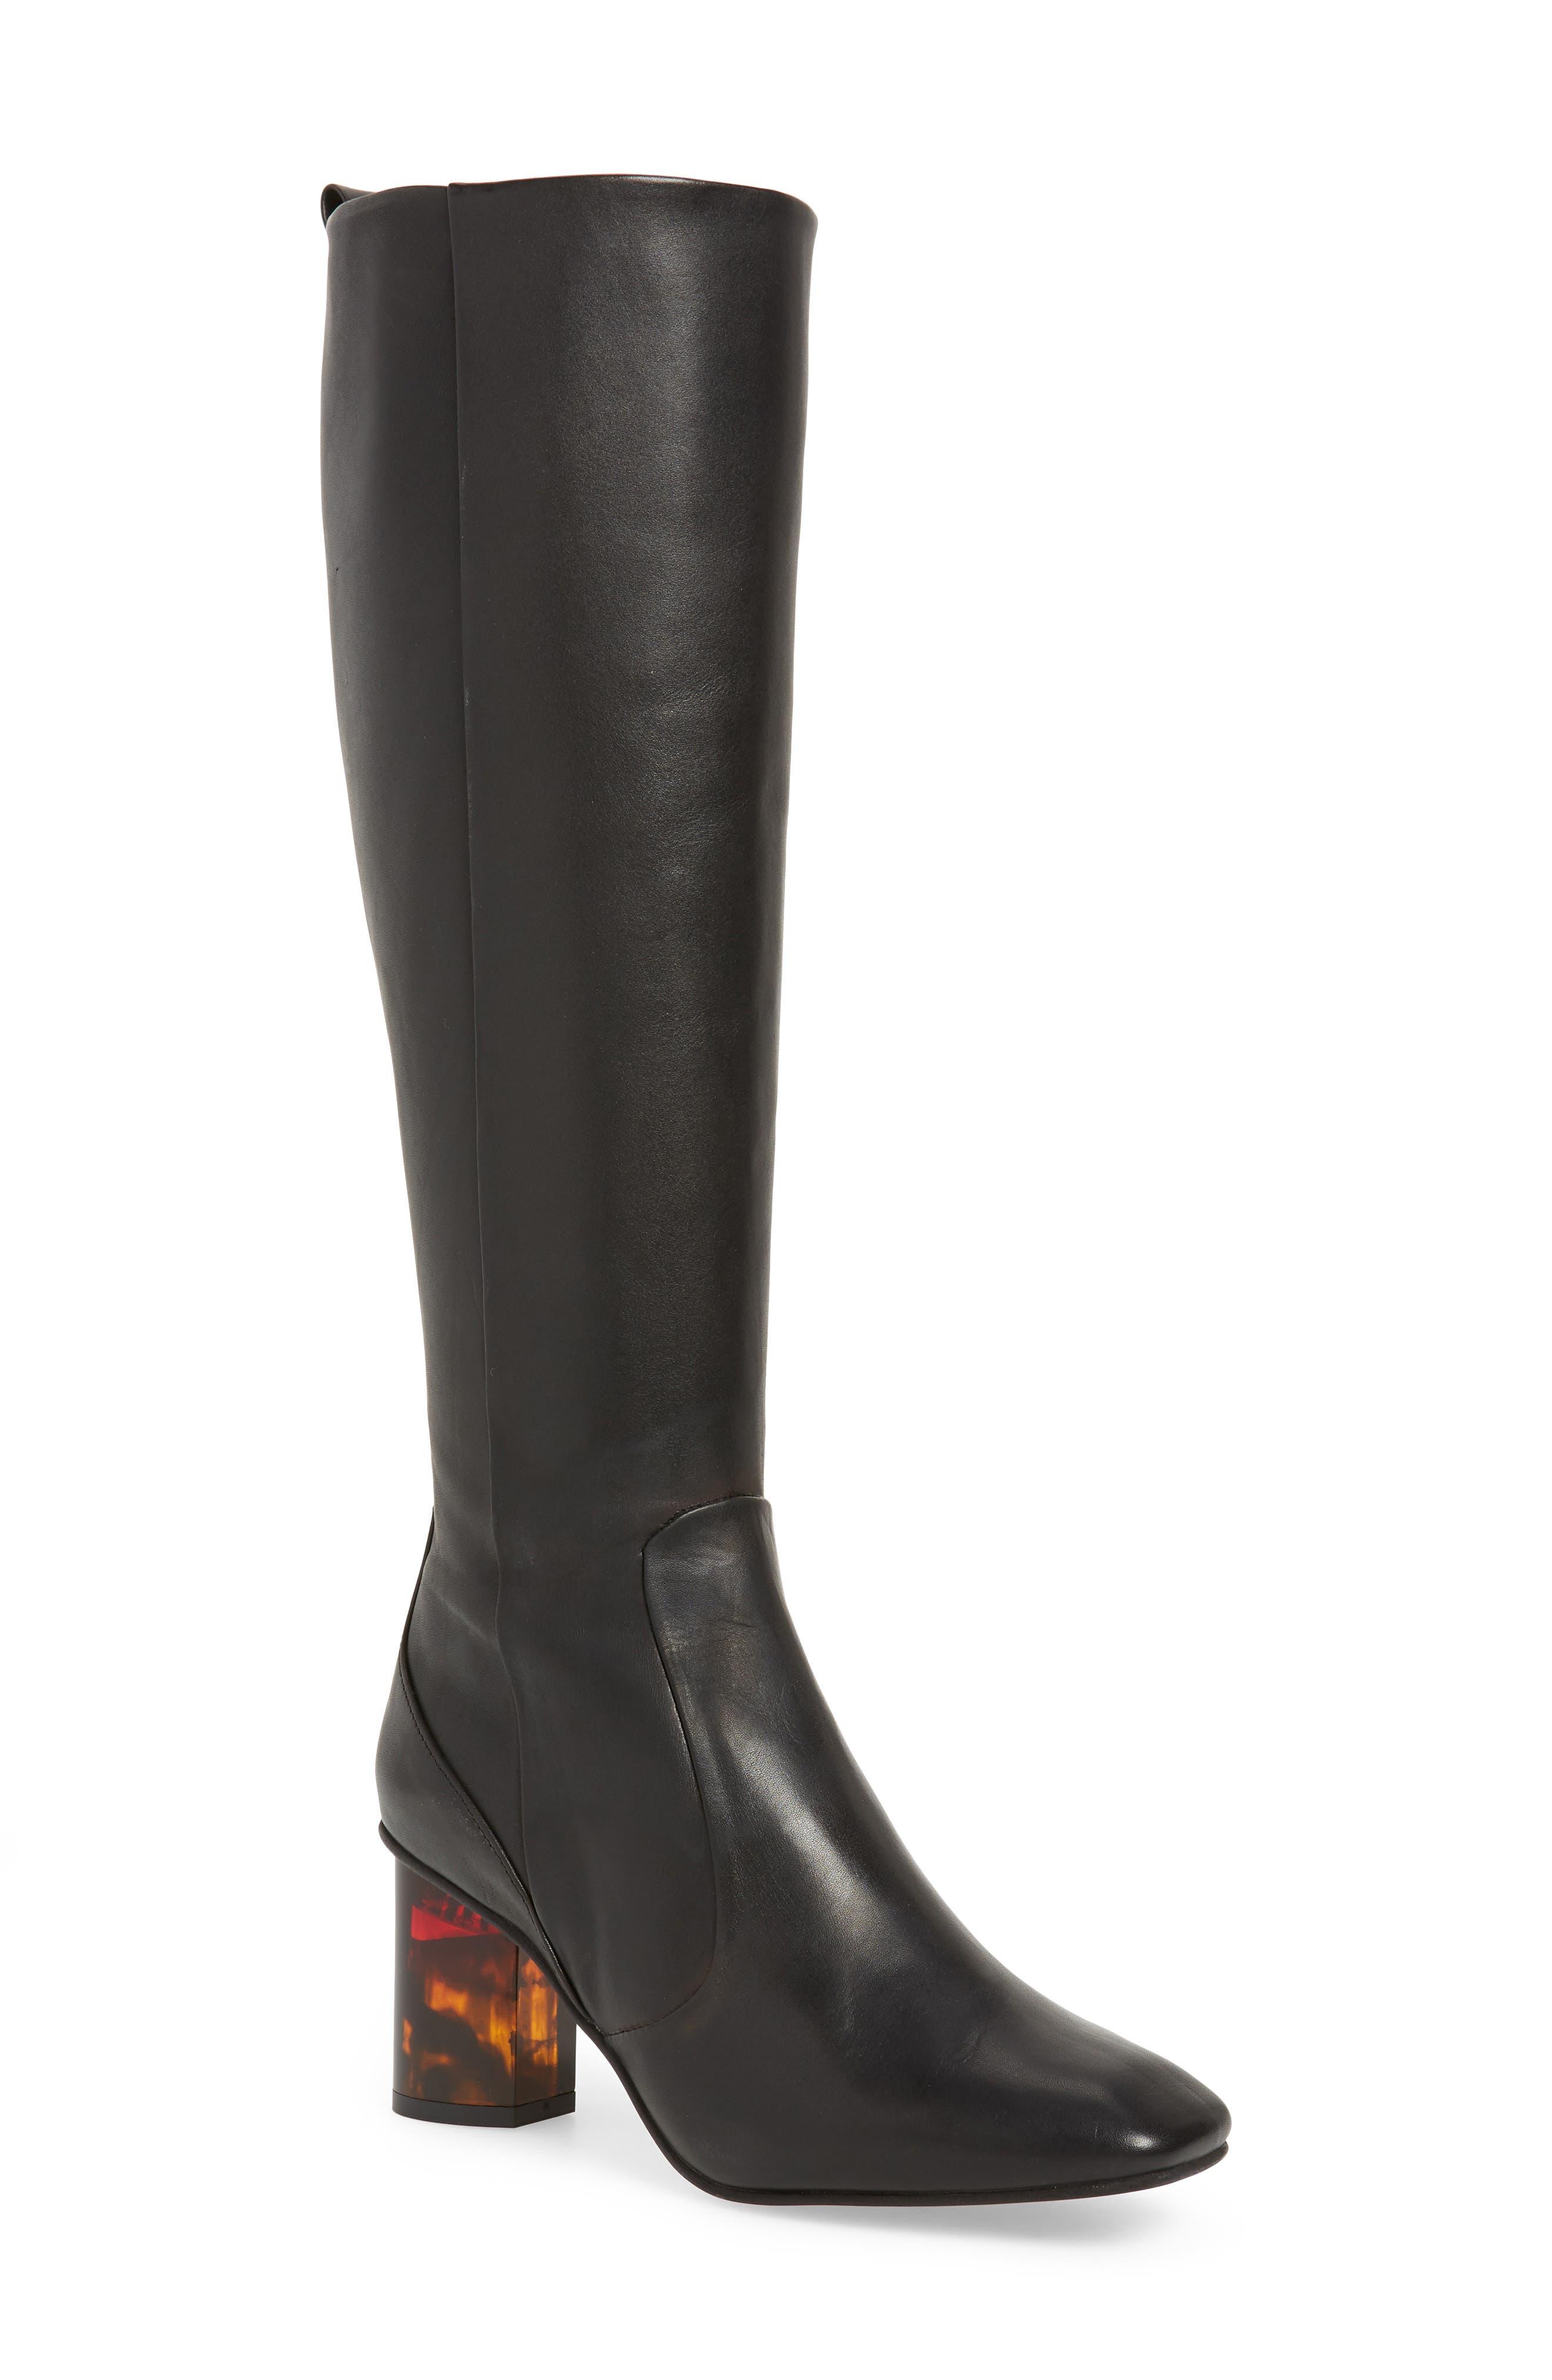 KURT GEIGER Women'S Stride Block-Heel Boots in Black Leather